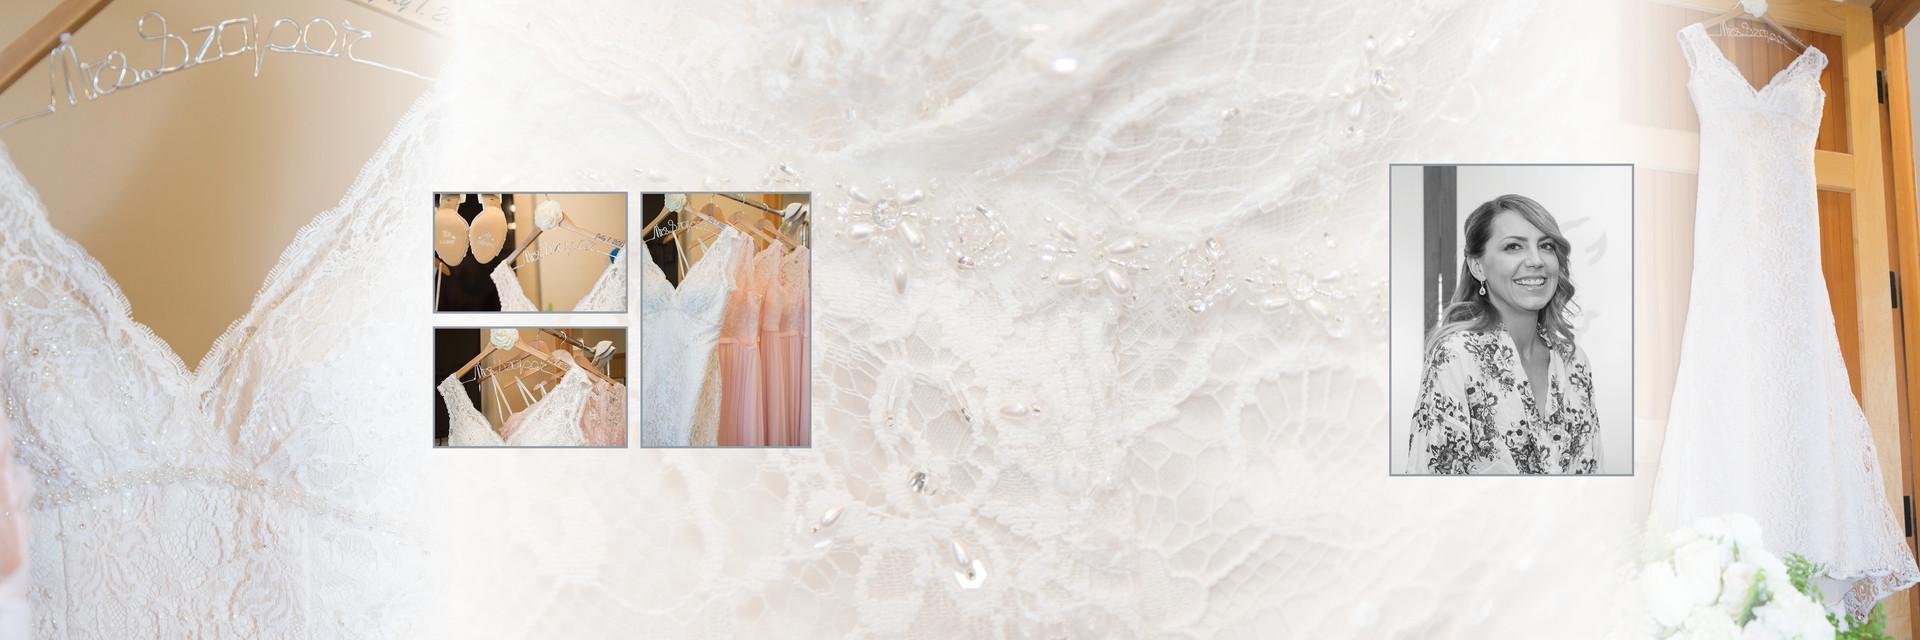 Album 1 Soc.jpg